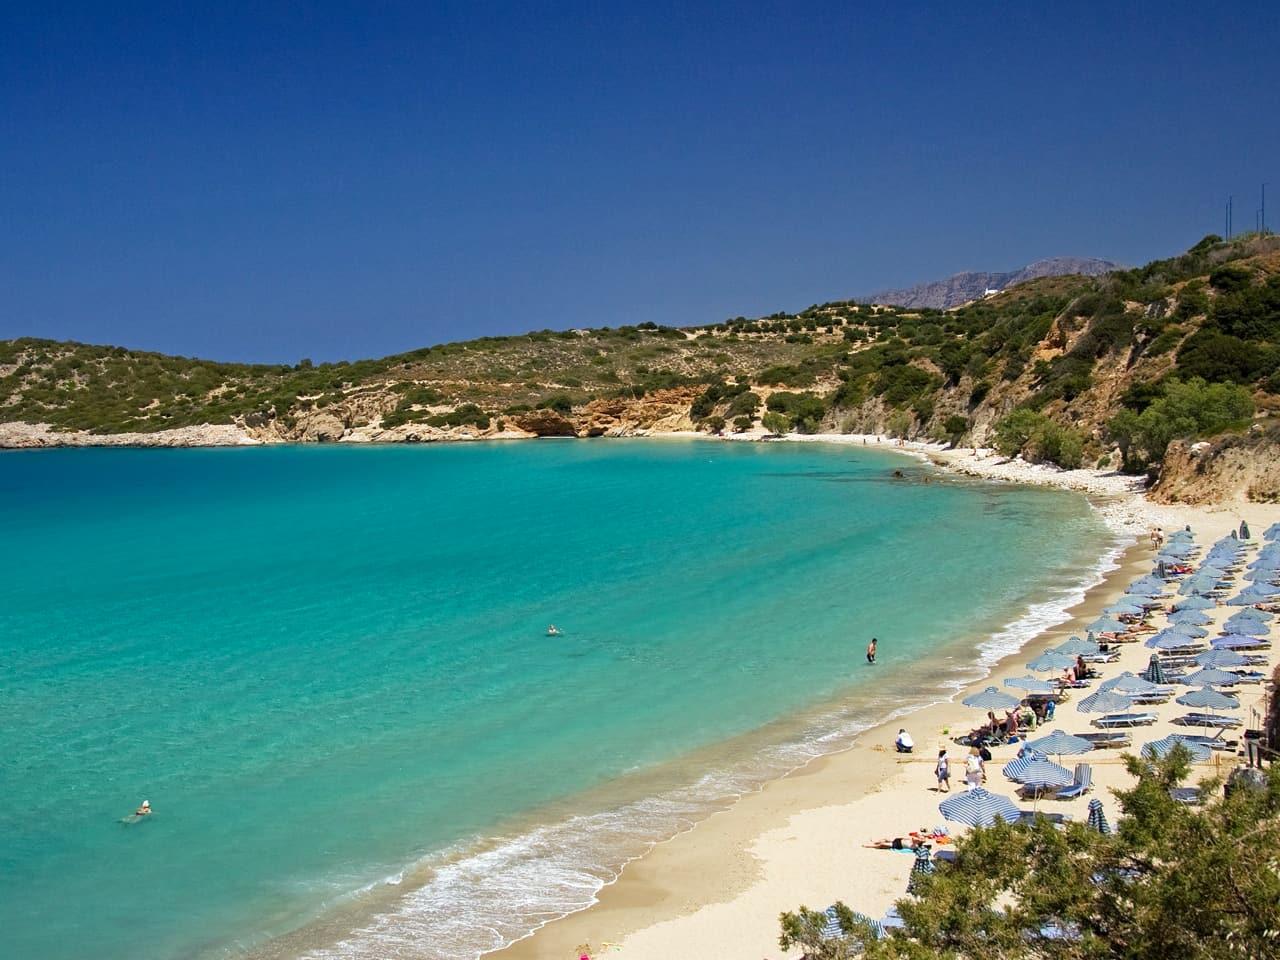 Daily Yacht Cruise To Mochlos Fish Village, boat trip to mochlos village istron beach, activities agios nikolaos, boat trip karavostasi beach, best activities east crete